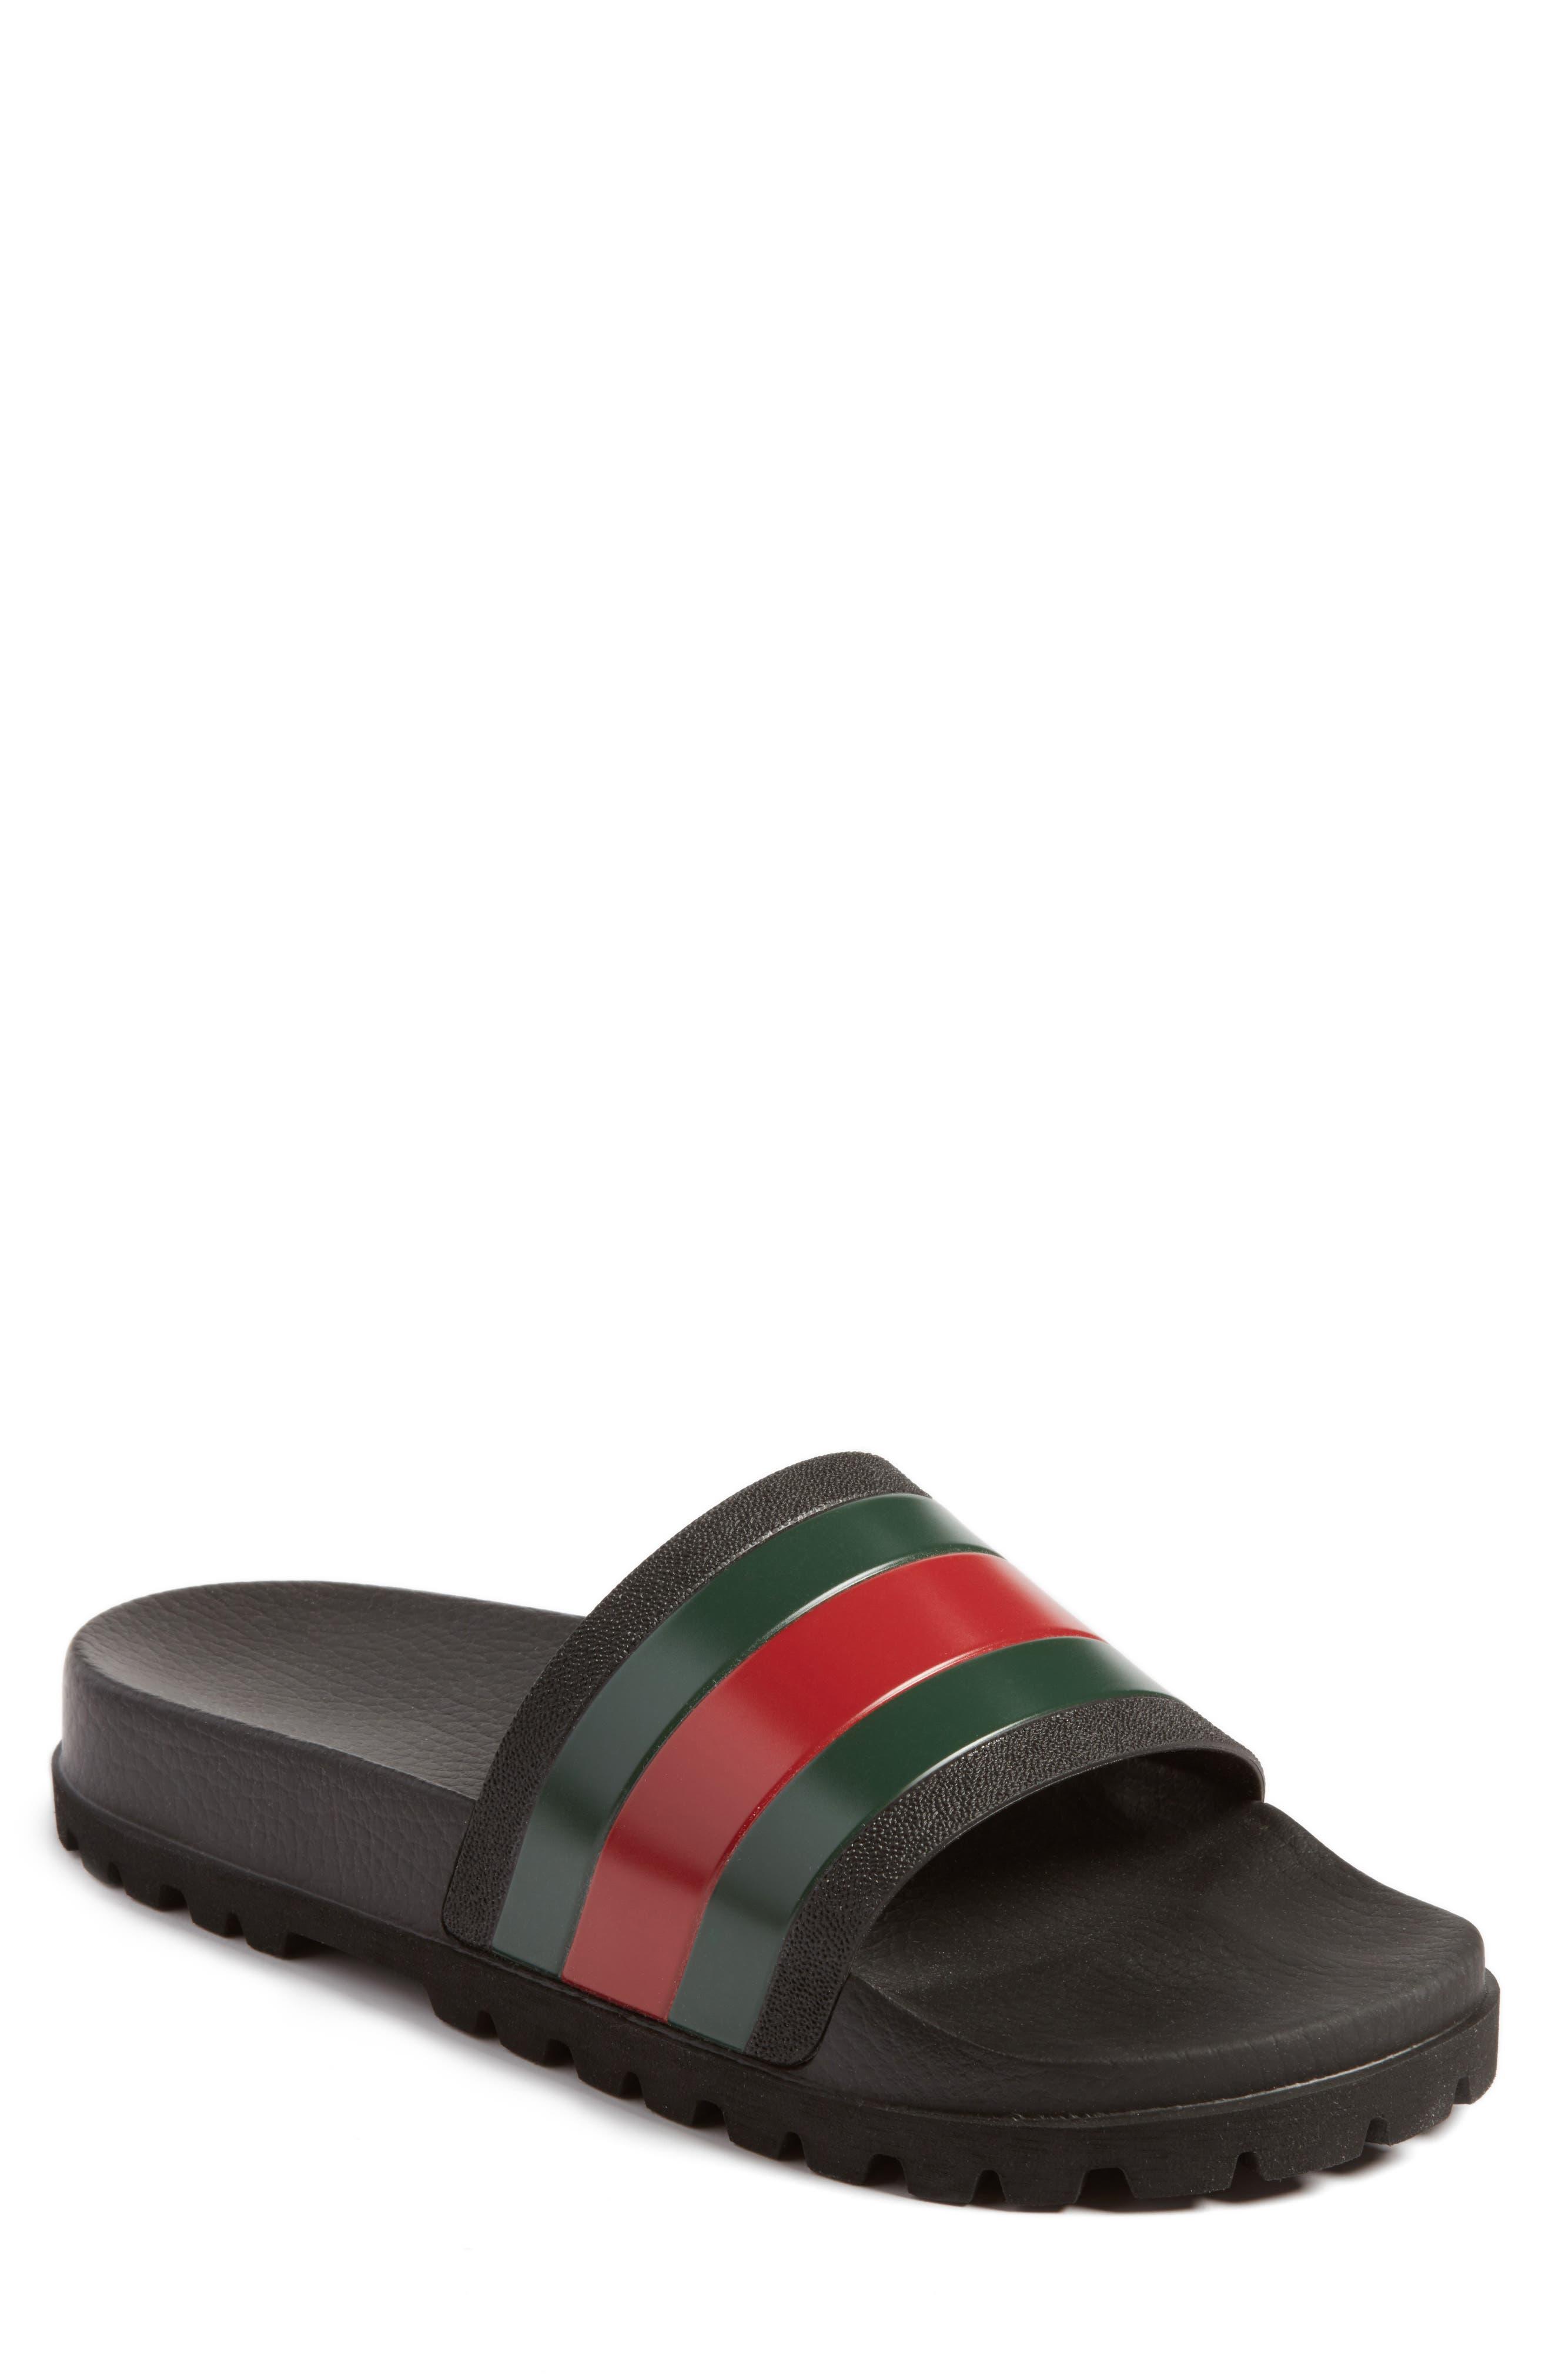 Main Image - Gucci 'Pursuit Treck' Slide Sandal (Men)